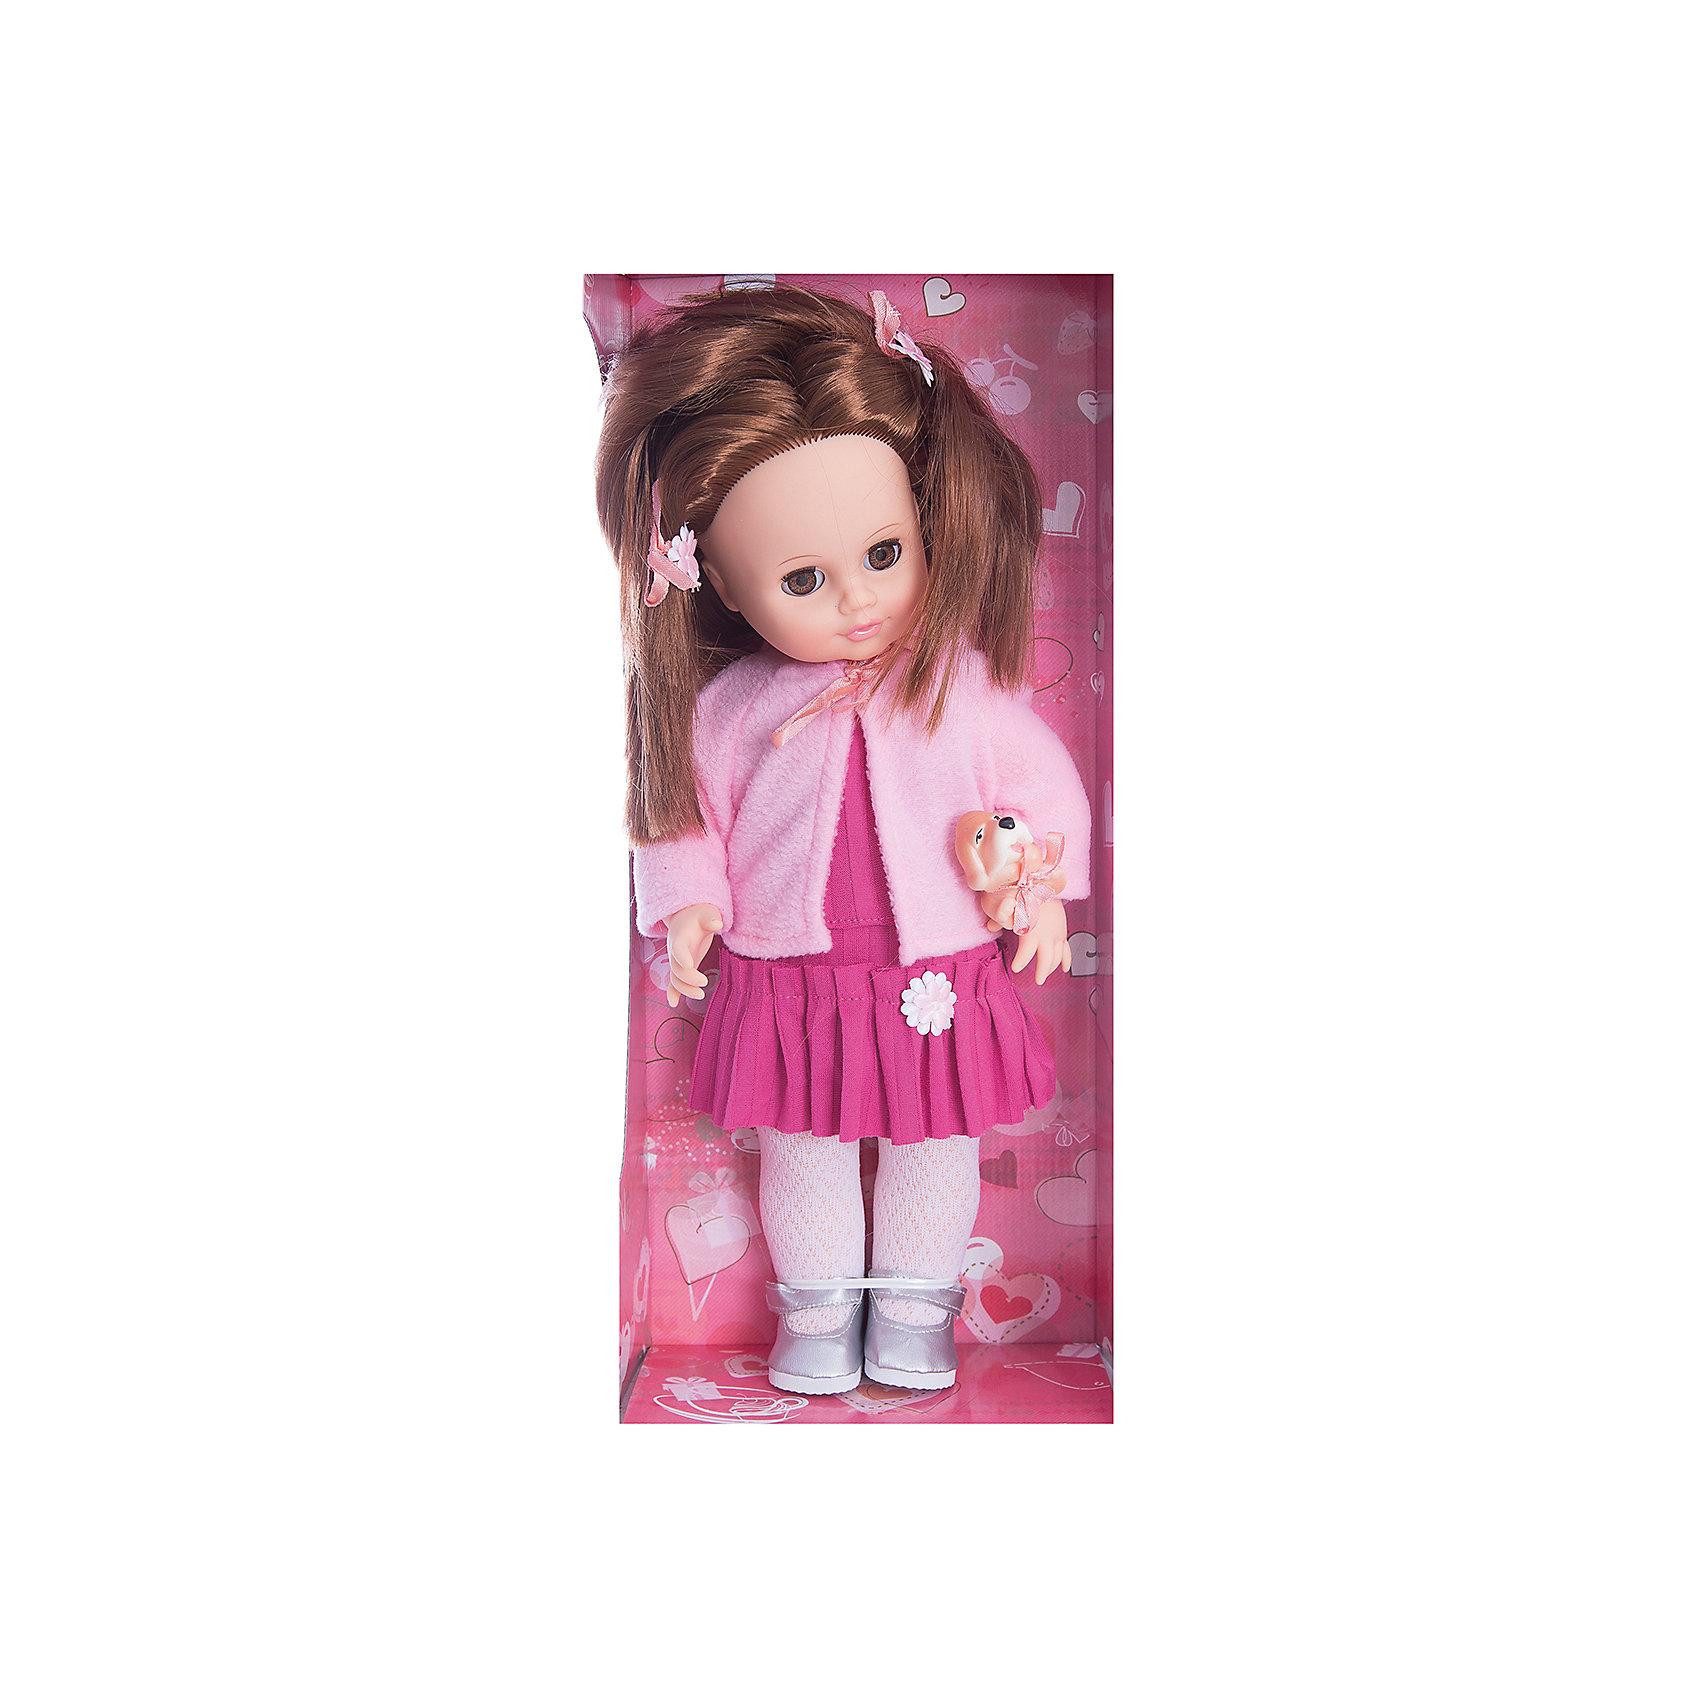 Весна Кукла Анна с собачкой, 43 см, со звуком, Весна кукла весна алсу 35 см со звуком в1634 о